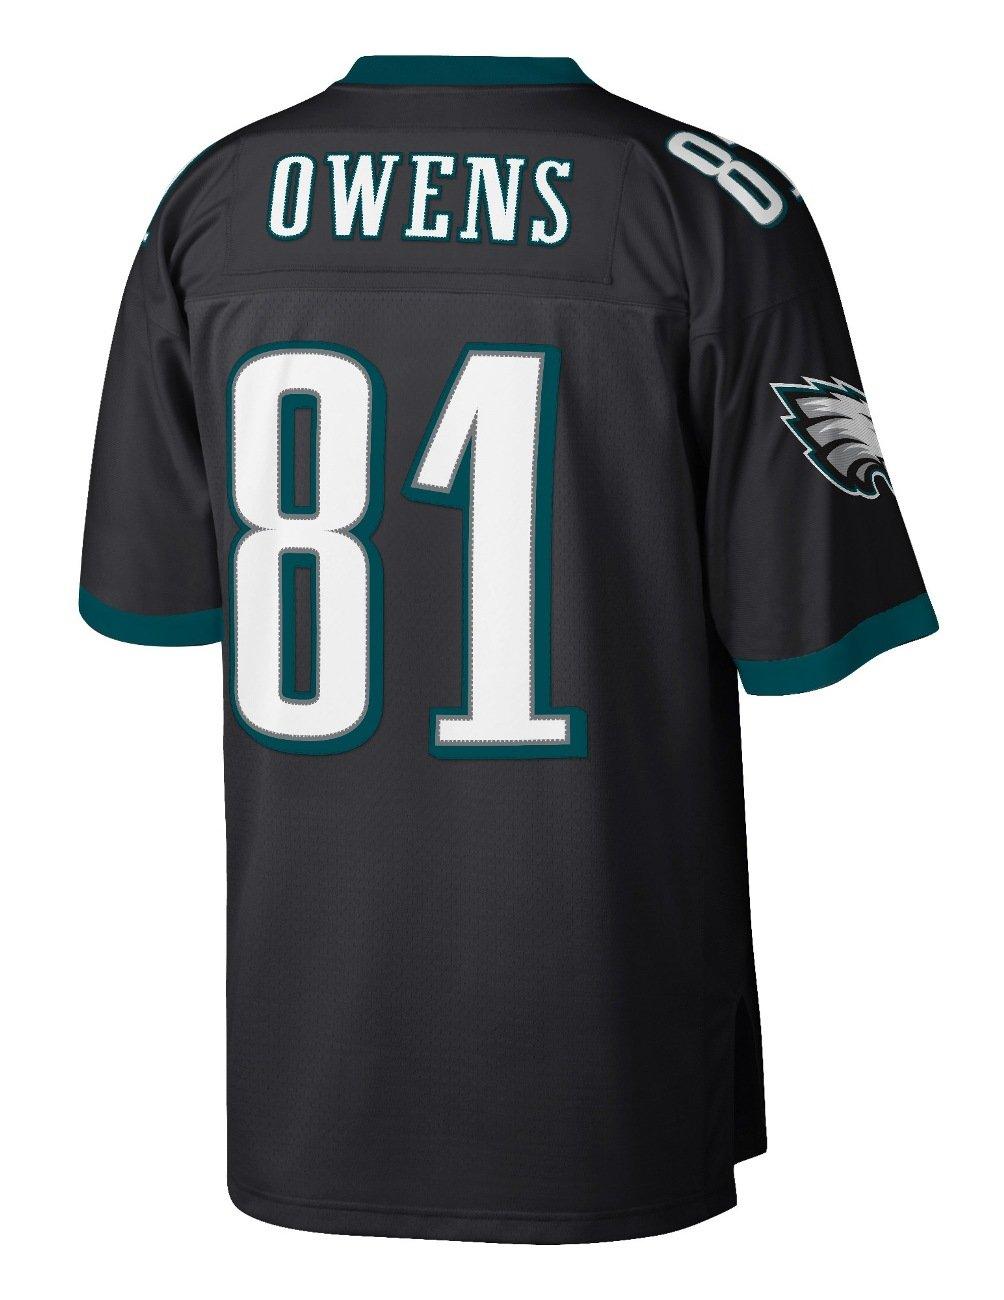 quality design ab2d5 e309a Mitchell & Ness Philadelphia Eagles Terrell Owens 2004 Throwback Jersey